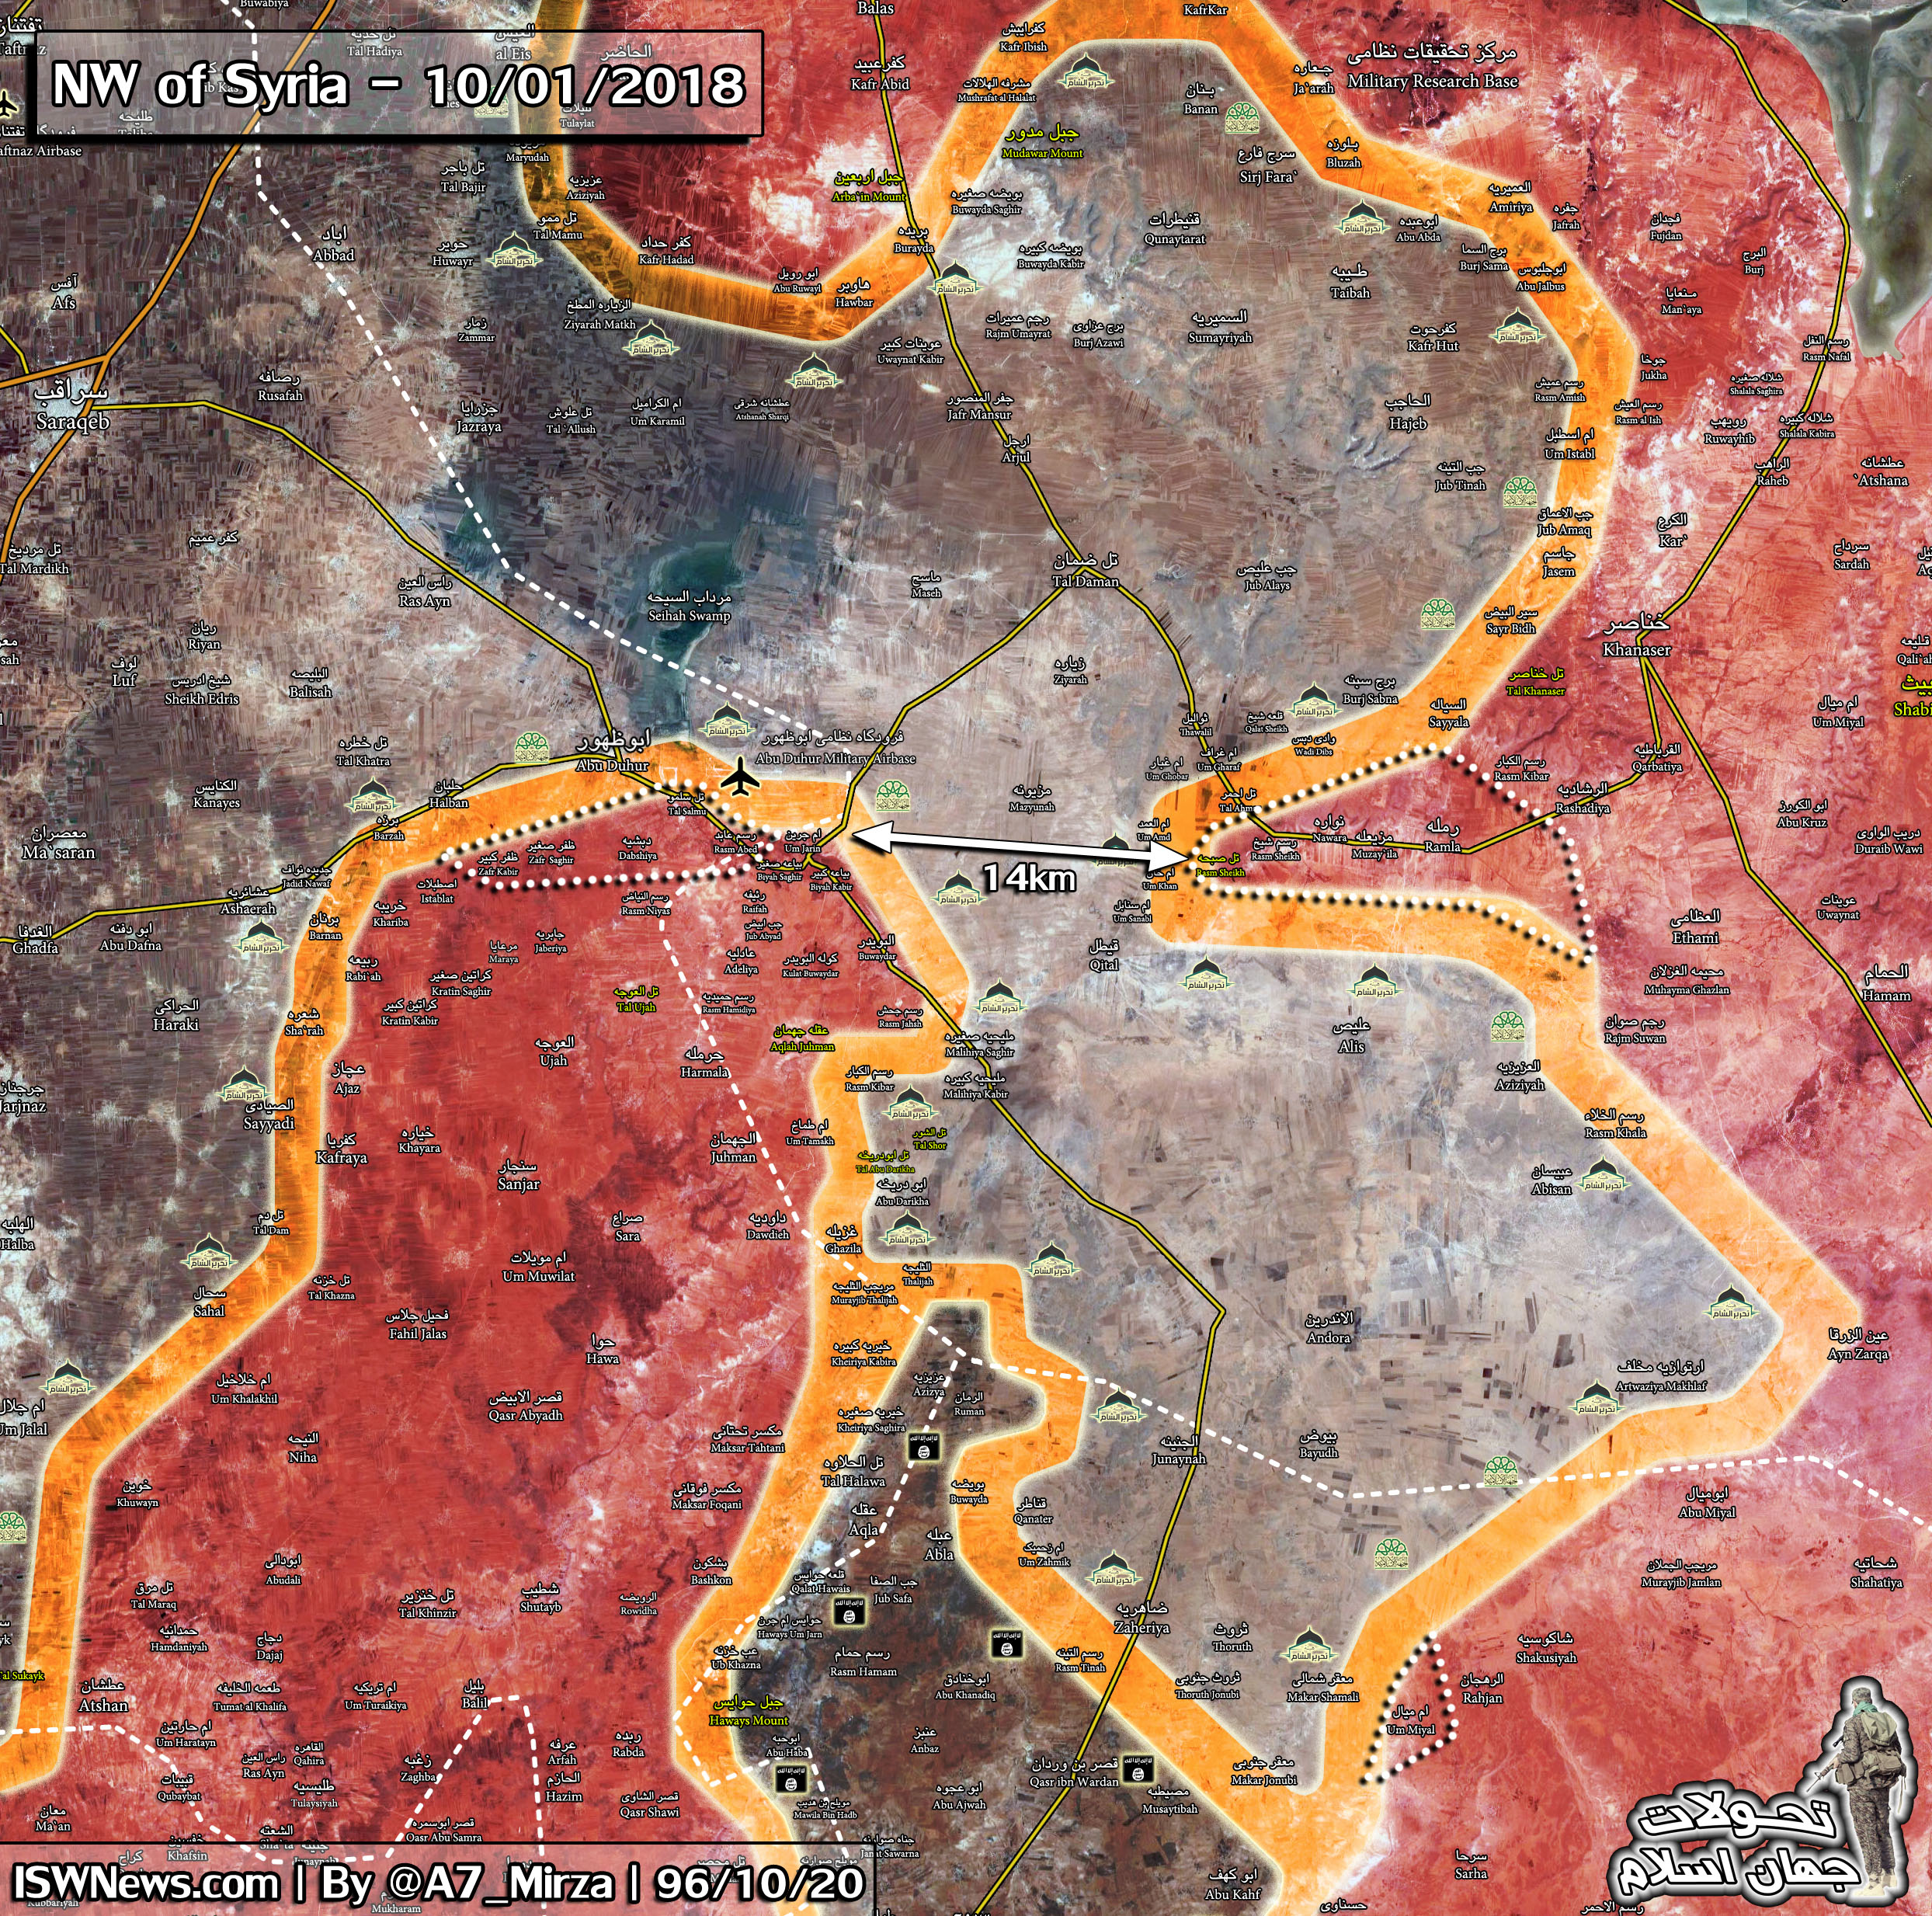 Syrian Army Launches Final Push To Liberate Abu al-Duhur Airbase